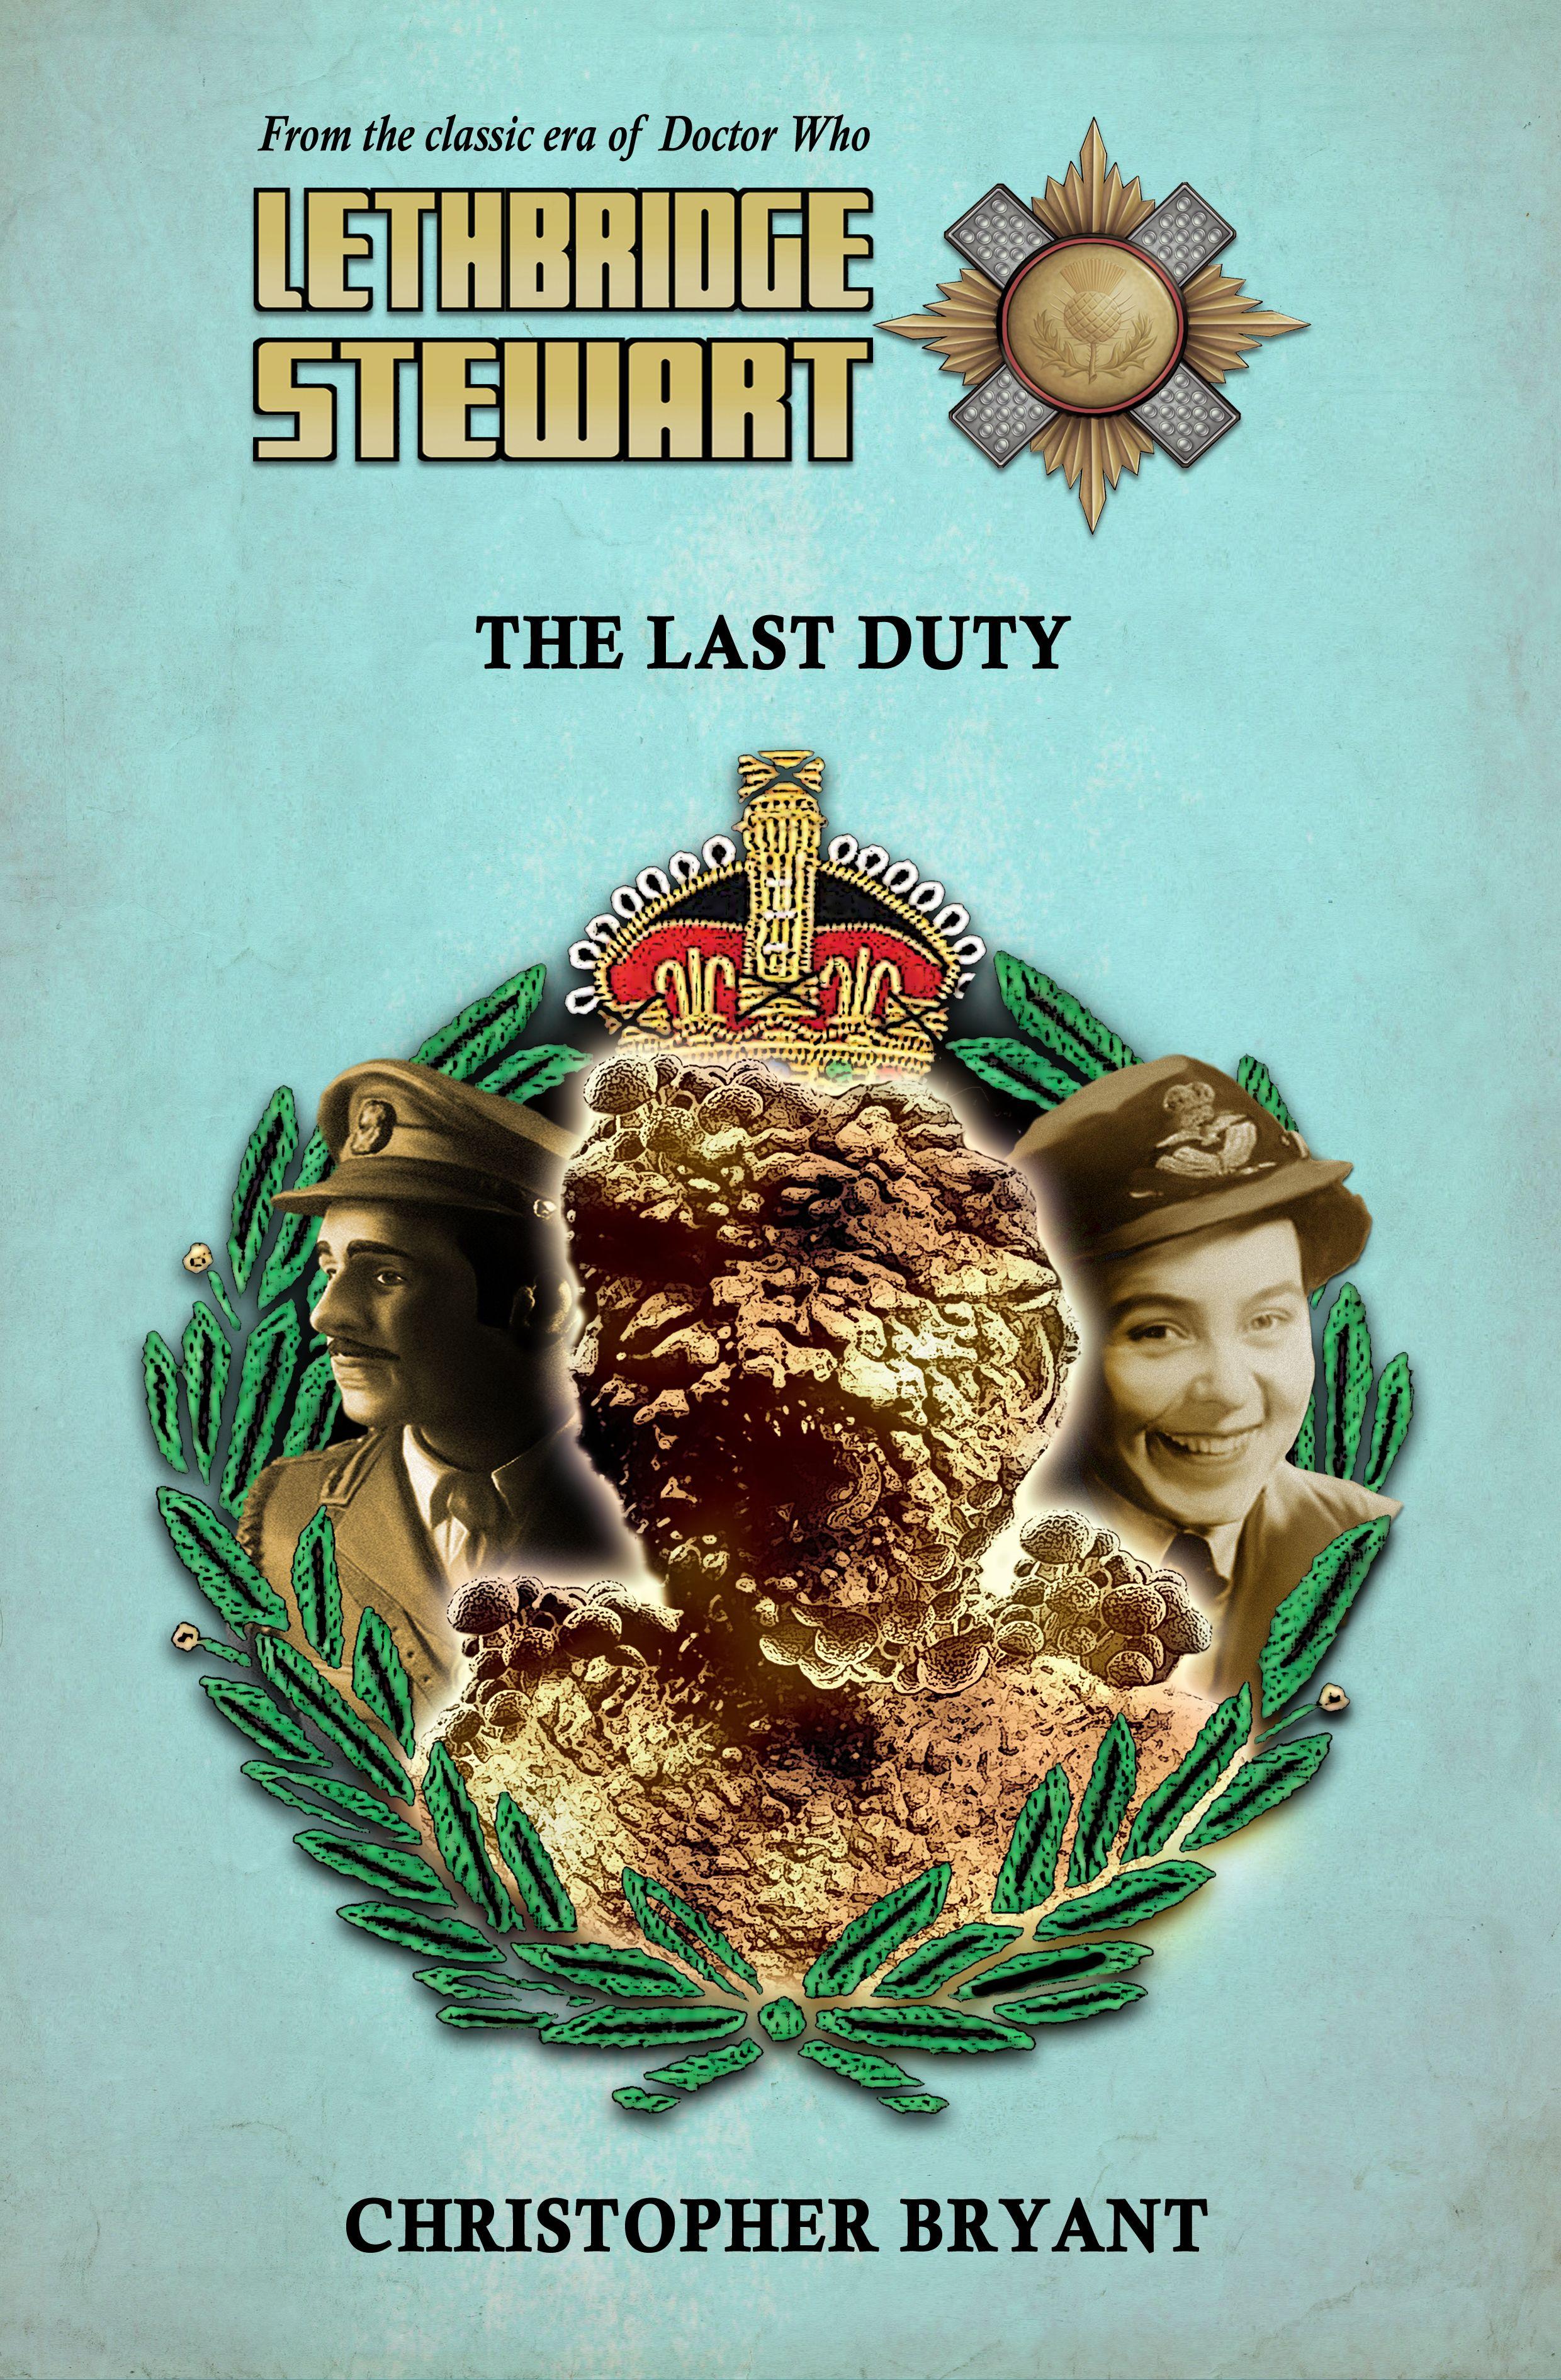 Lethbridge-Stewart: The Last Duty (Credit: Candy Jar Books)